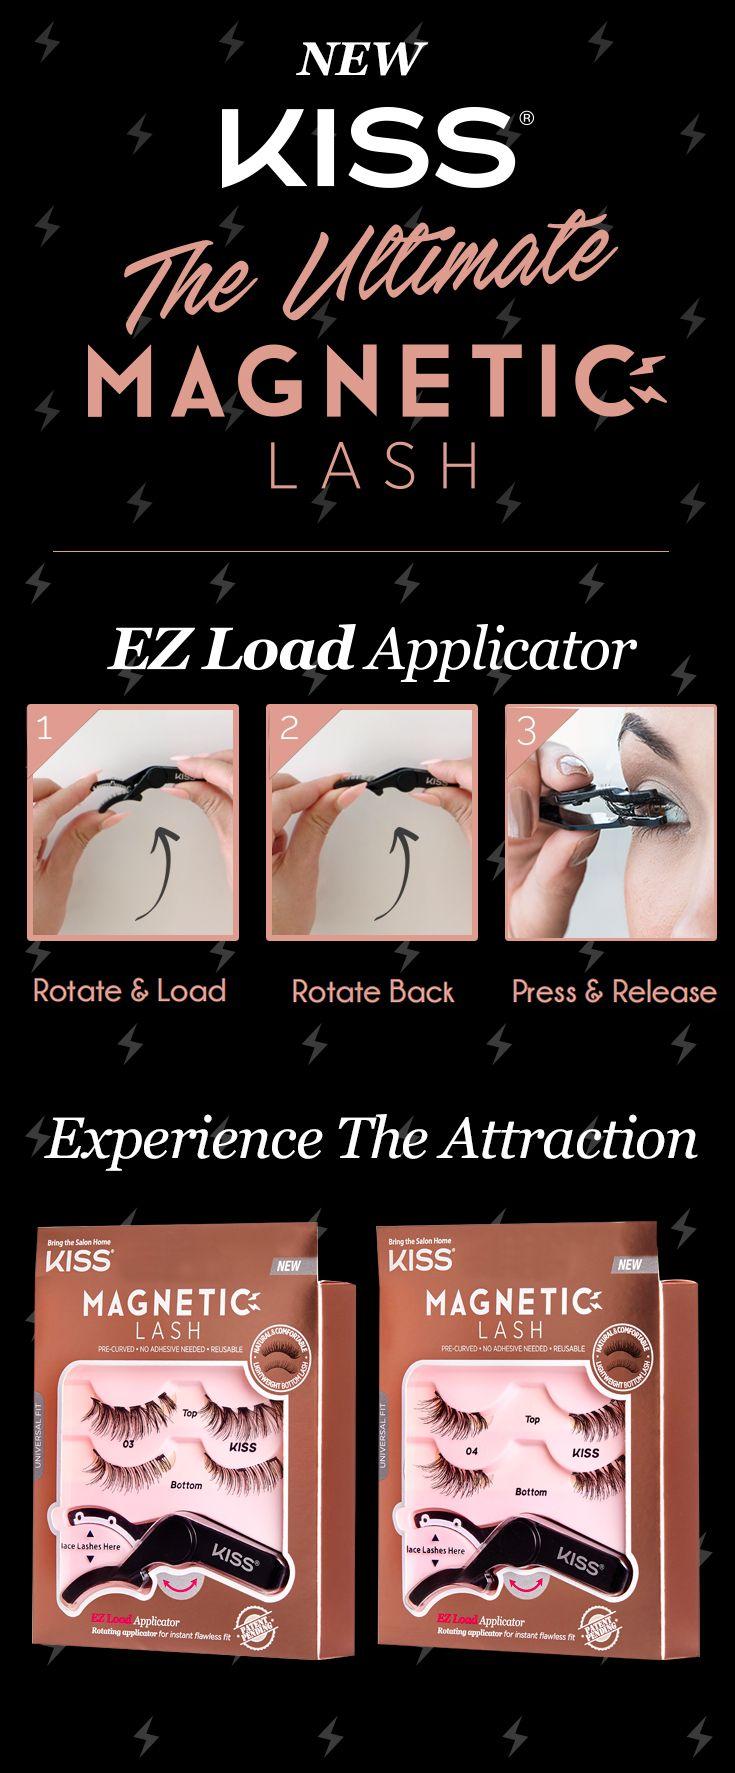 af202040c15 KISS Ultimate Magnetic Lash: the easiest lash you'll ever apply. Now at:  Walgreens, CVS, Walmart & Ulta. #KISSMagneticLash #BeKISSConfident